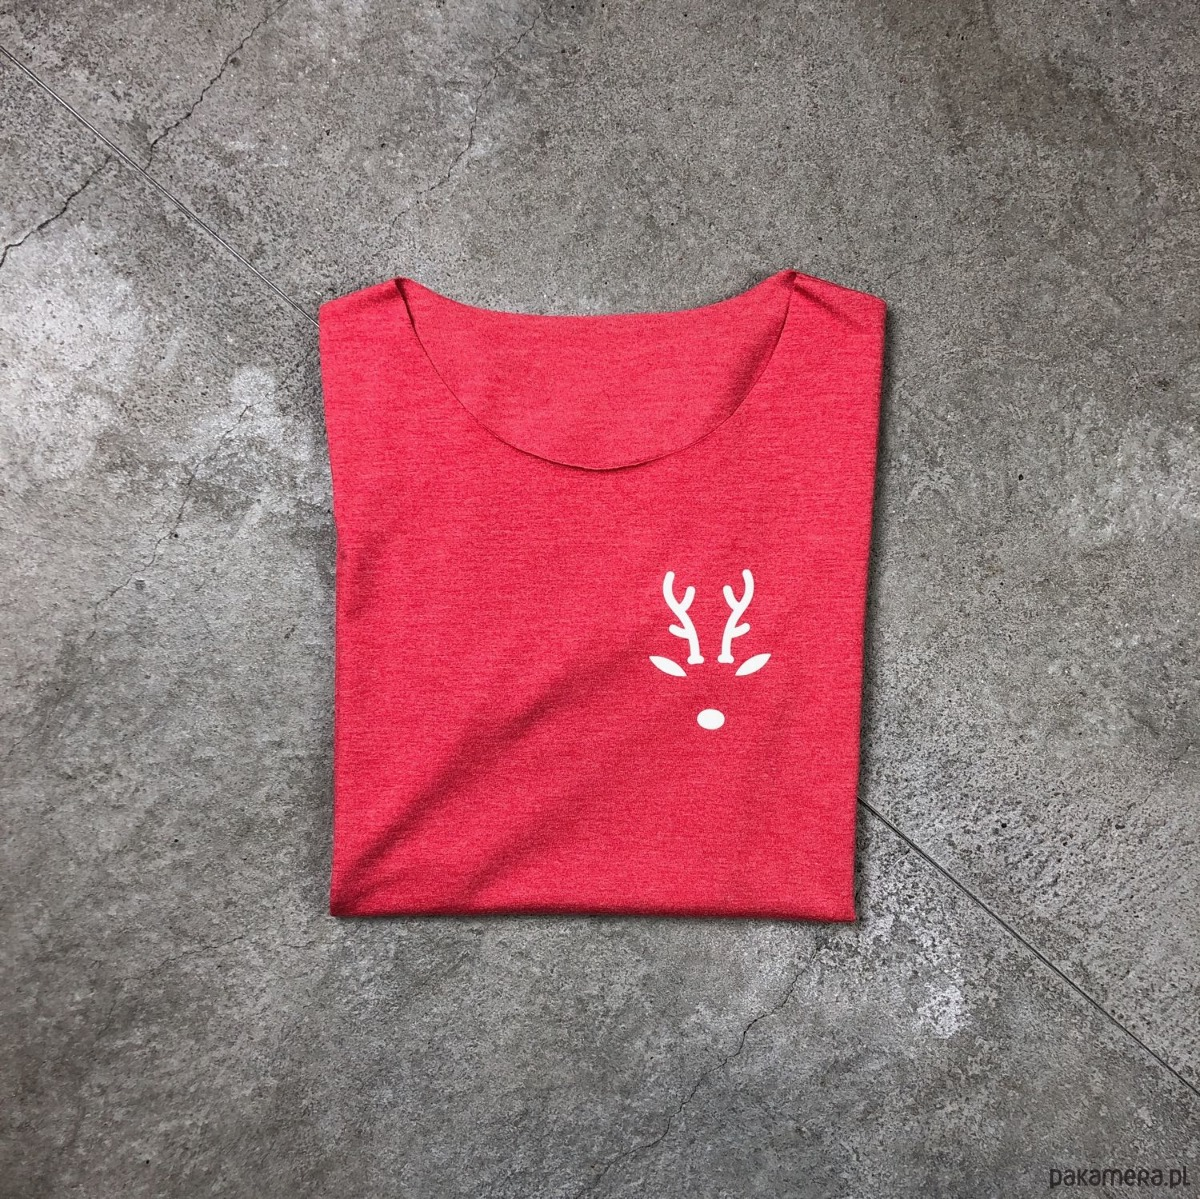 gshirt (renifer)